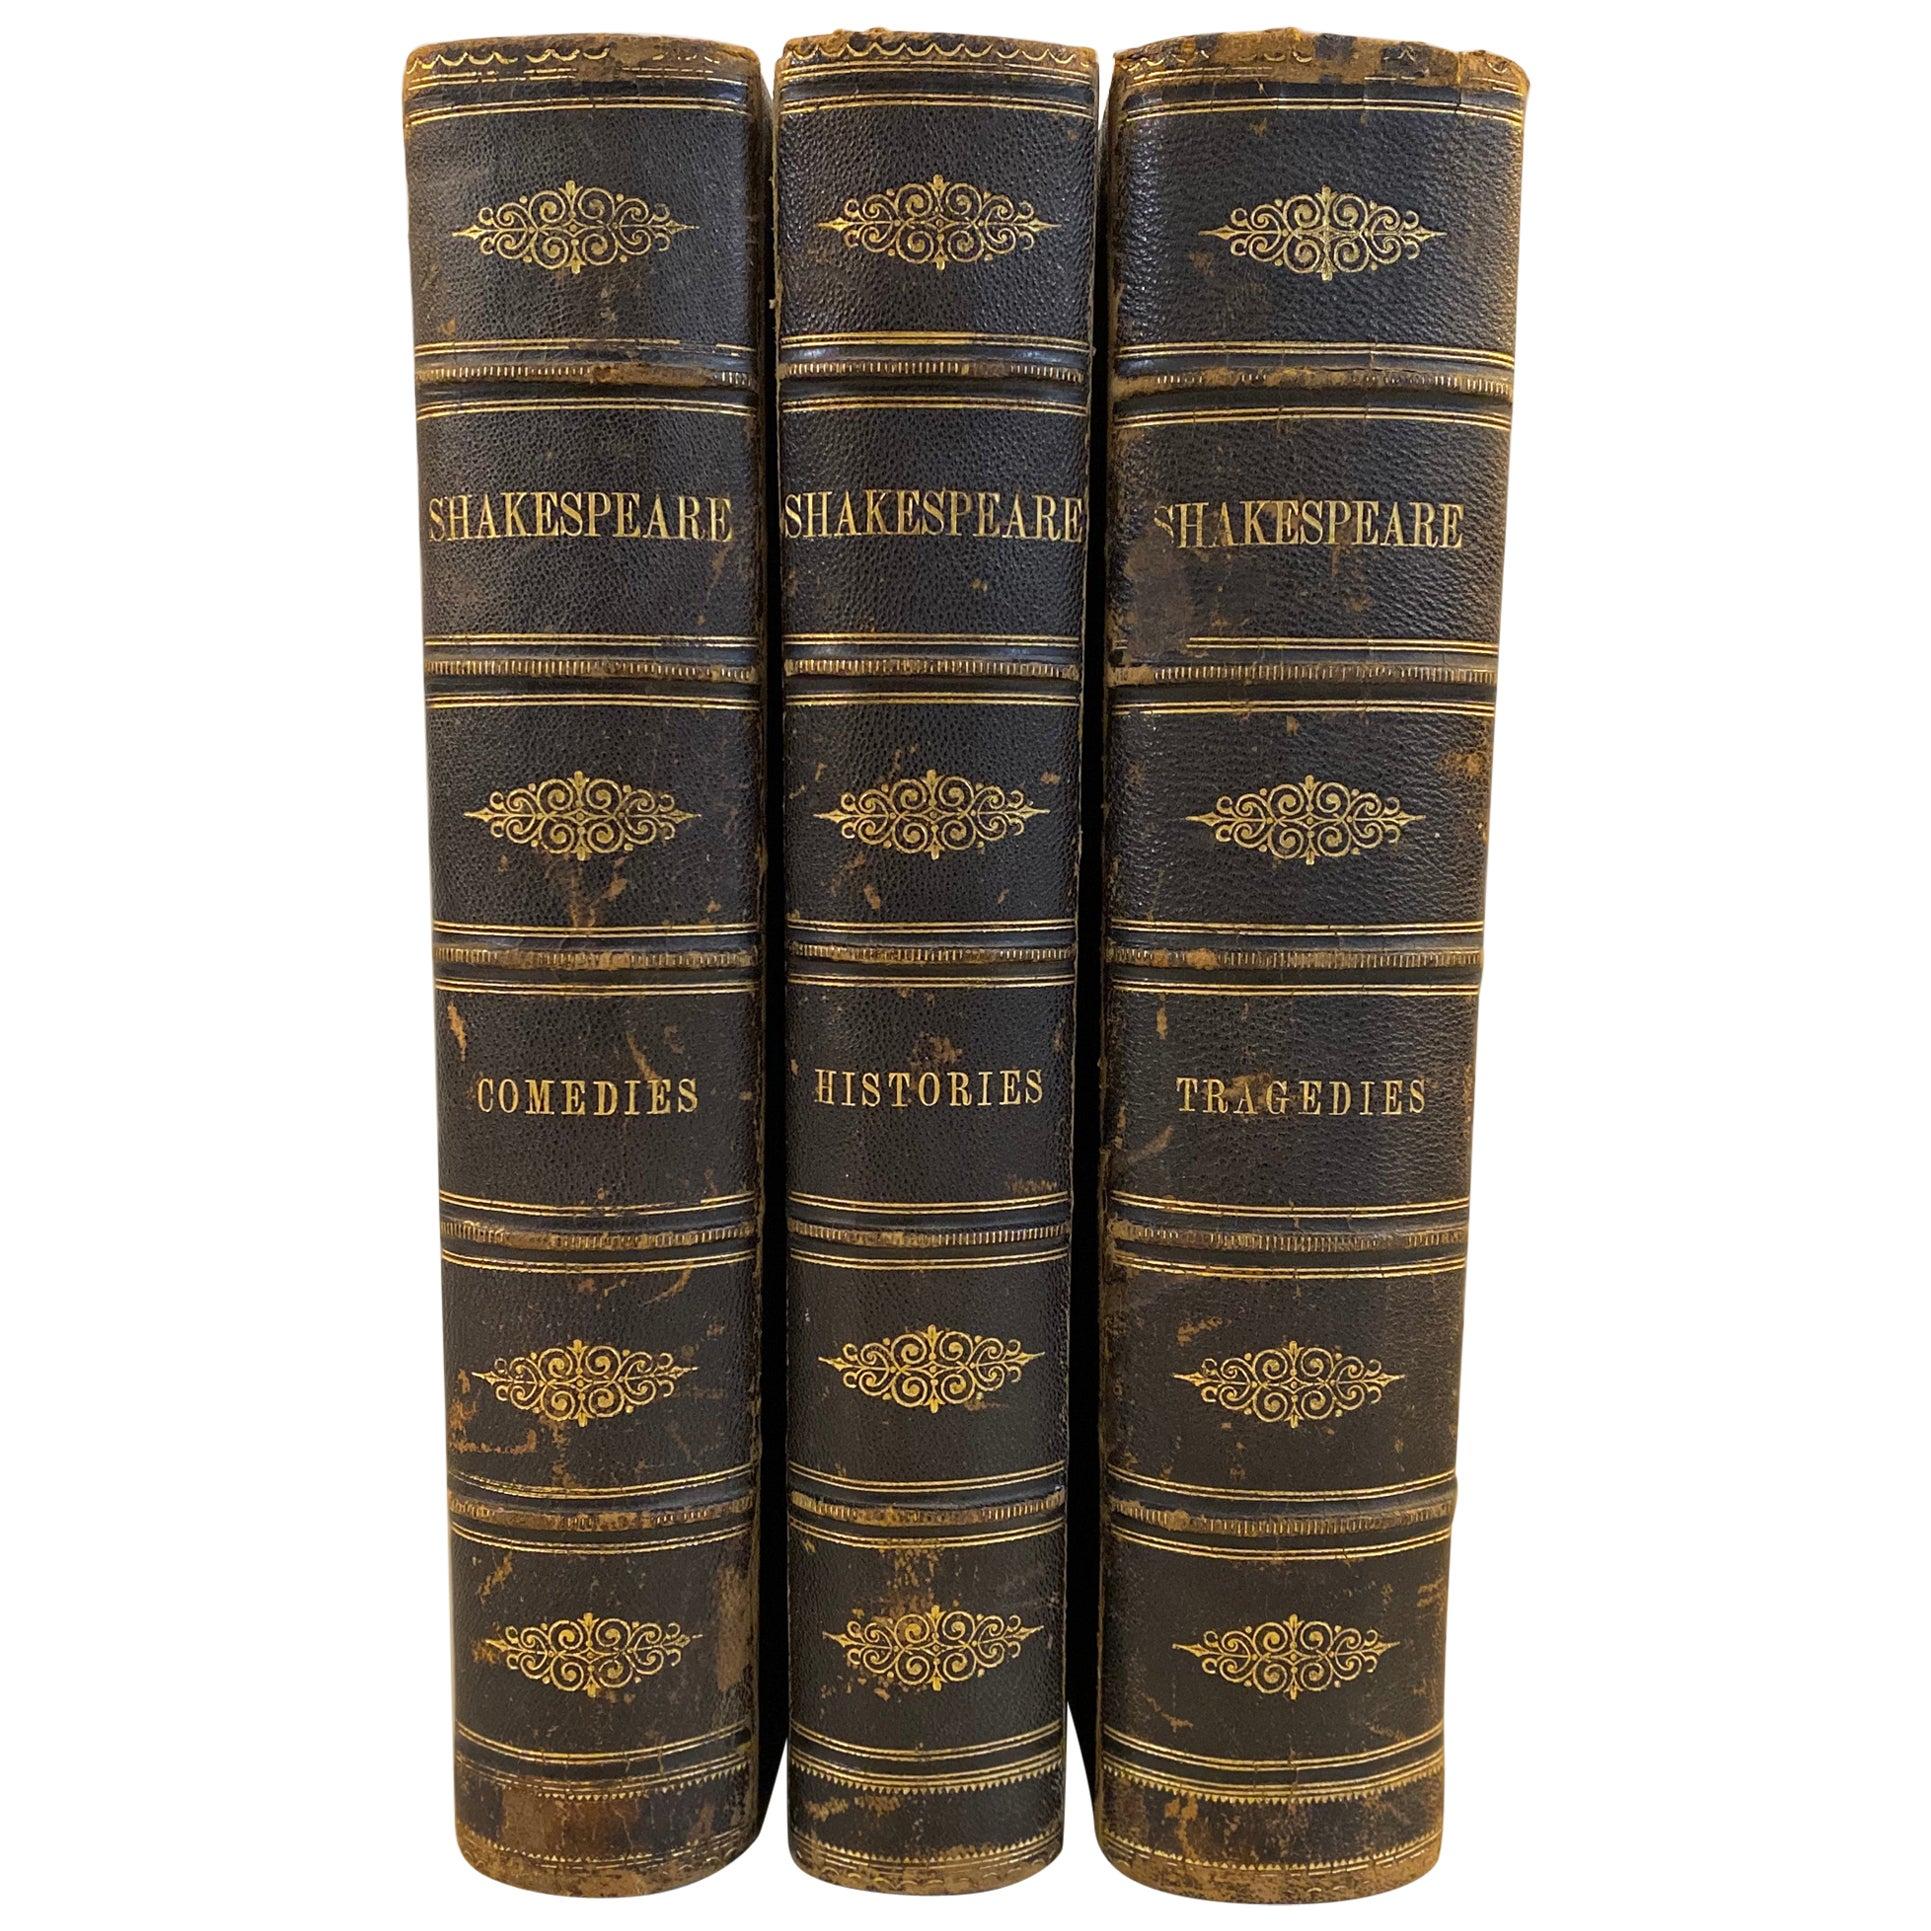 Works of William Shakespeare Comedies, Histories, Tragedies 3 Volumes